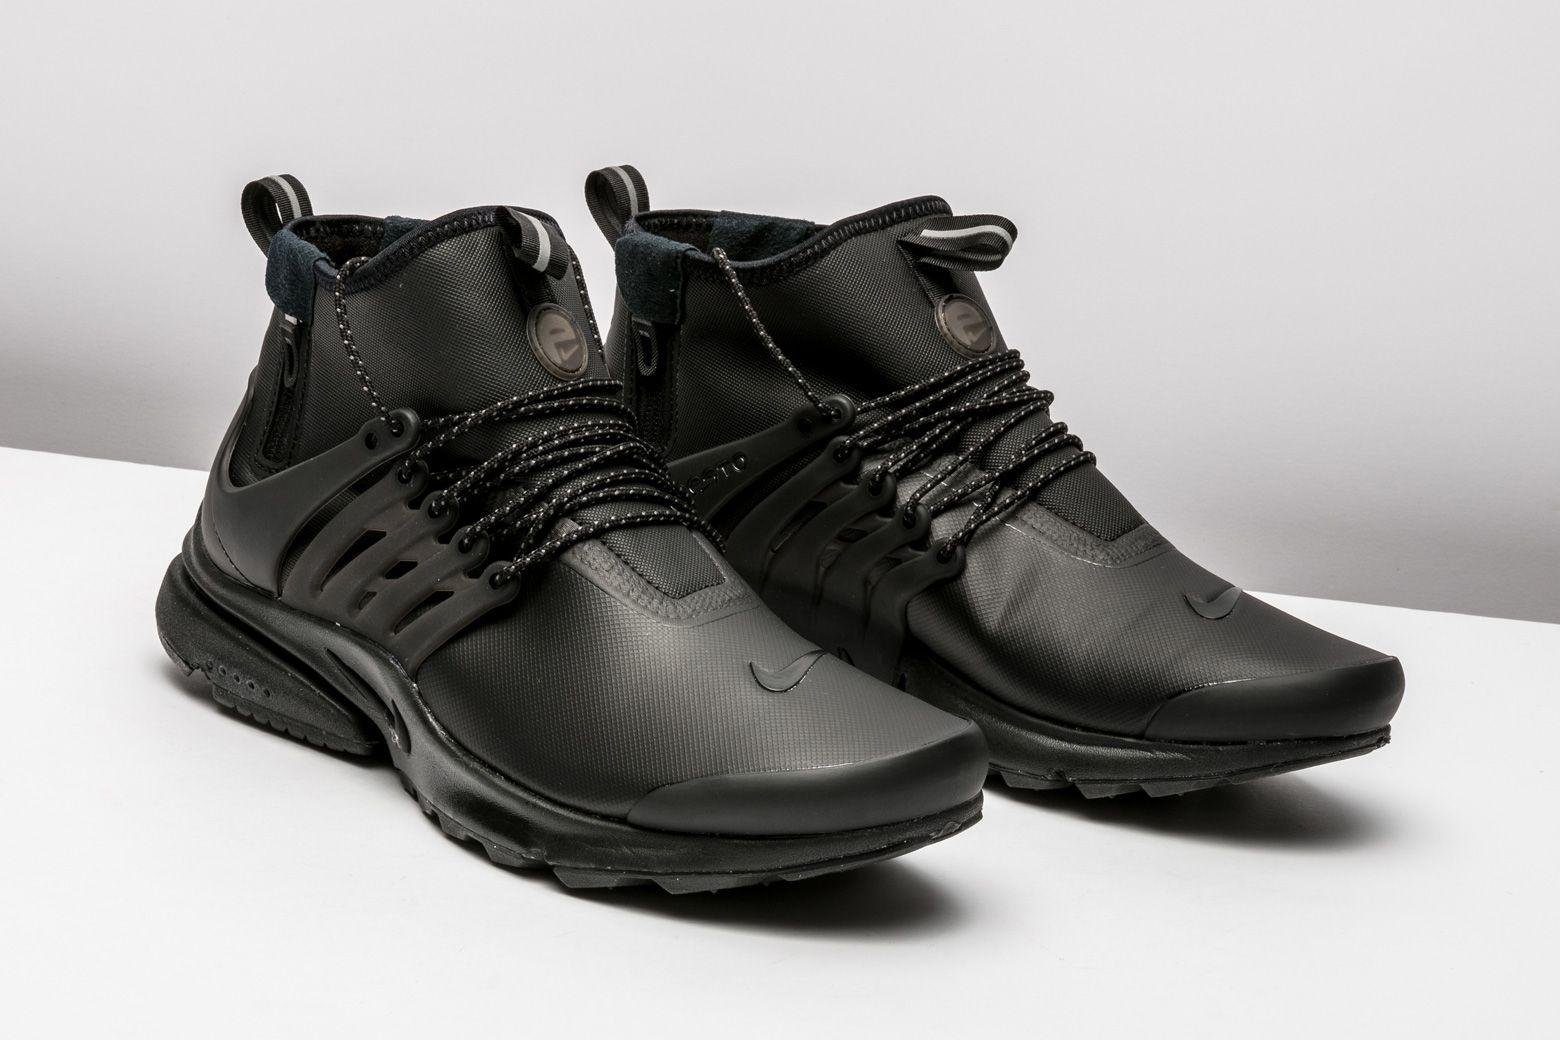 Nike Air Presto Mid Utility 859524 003 Nike Air Presto Air Presto All Black Sneakers